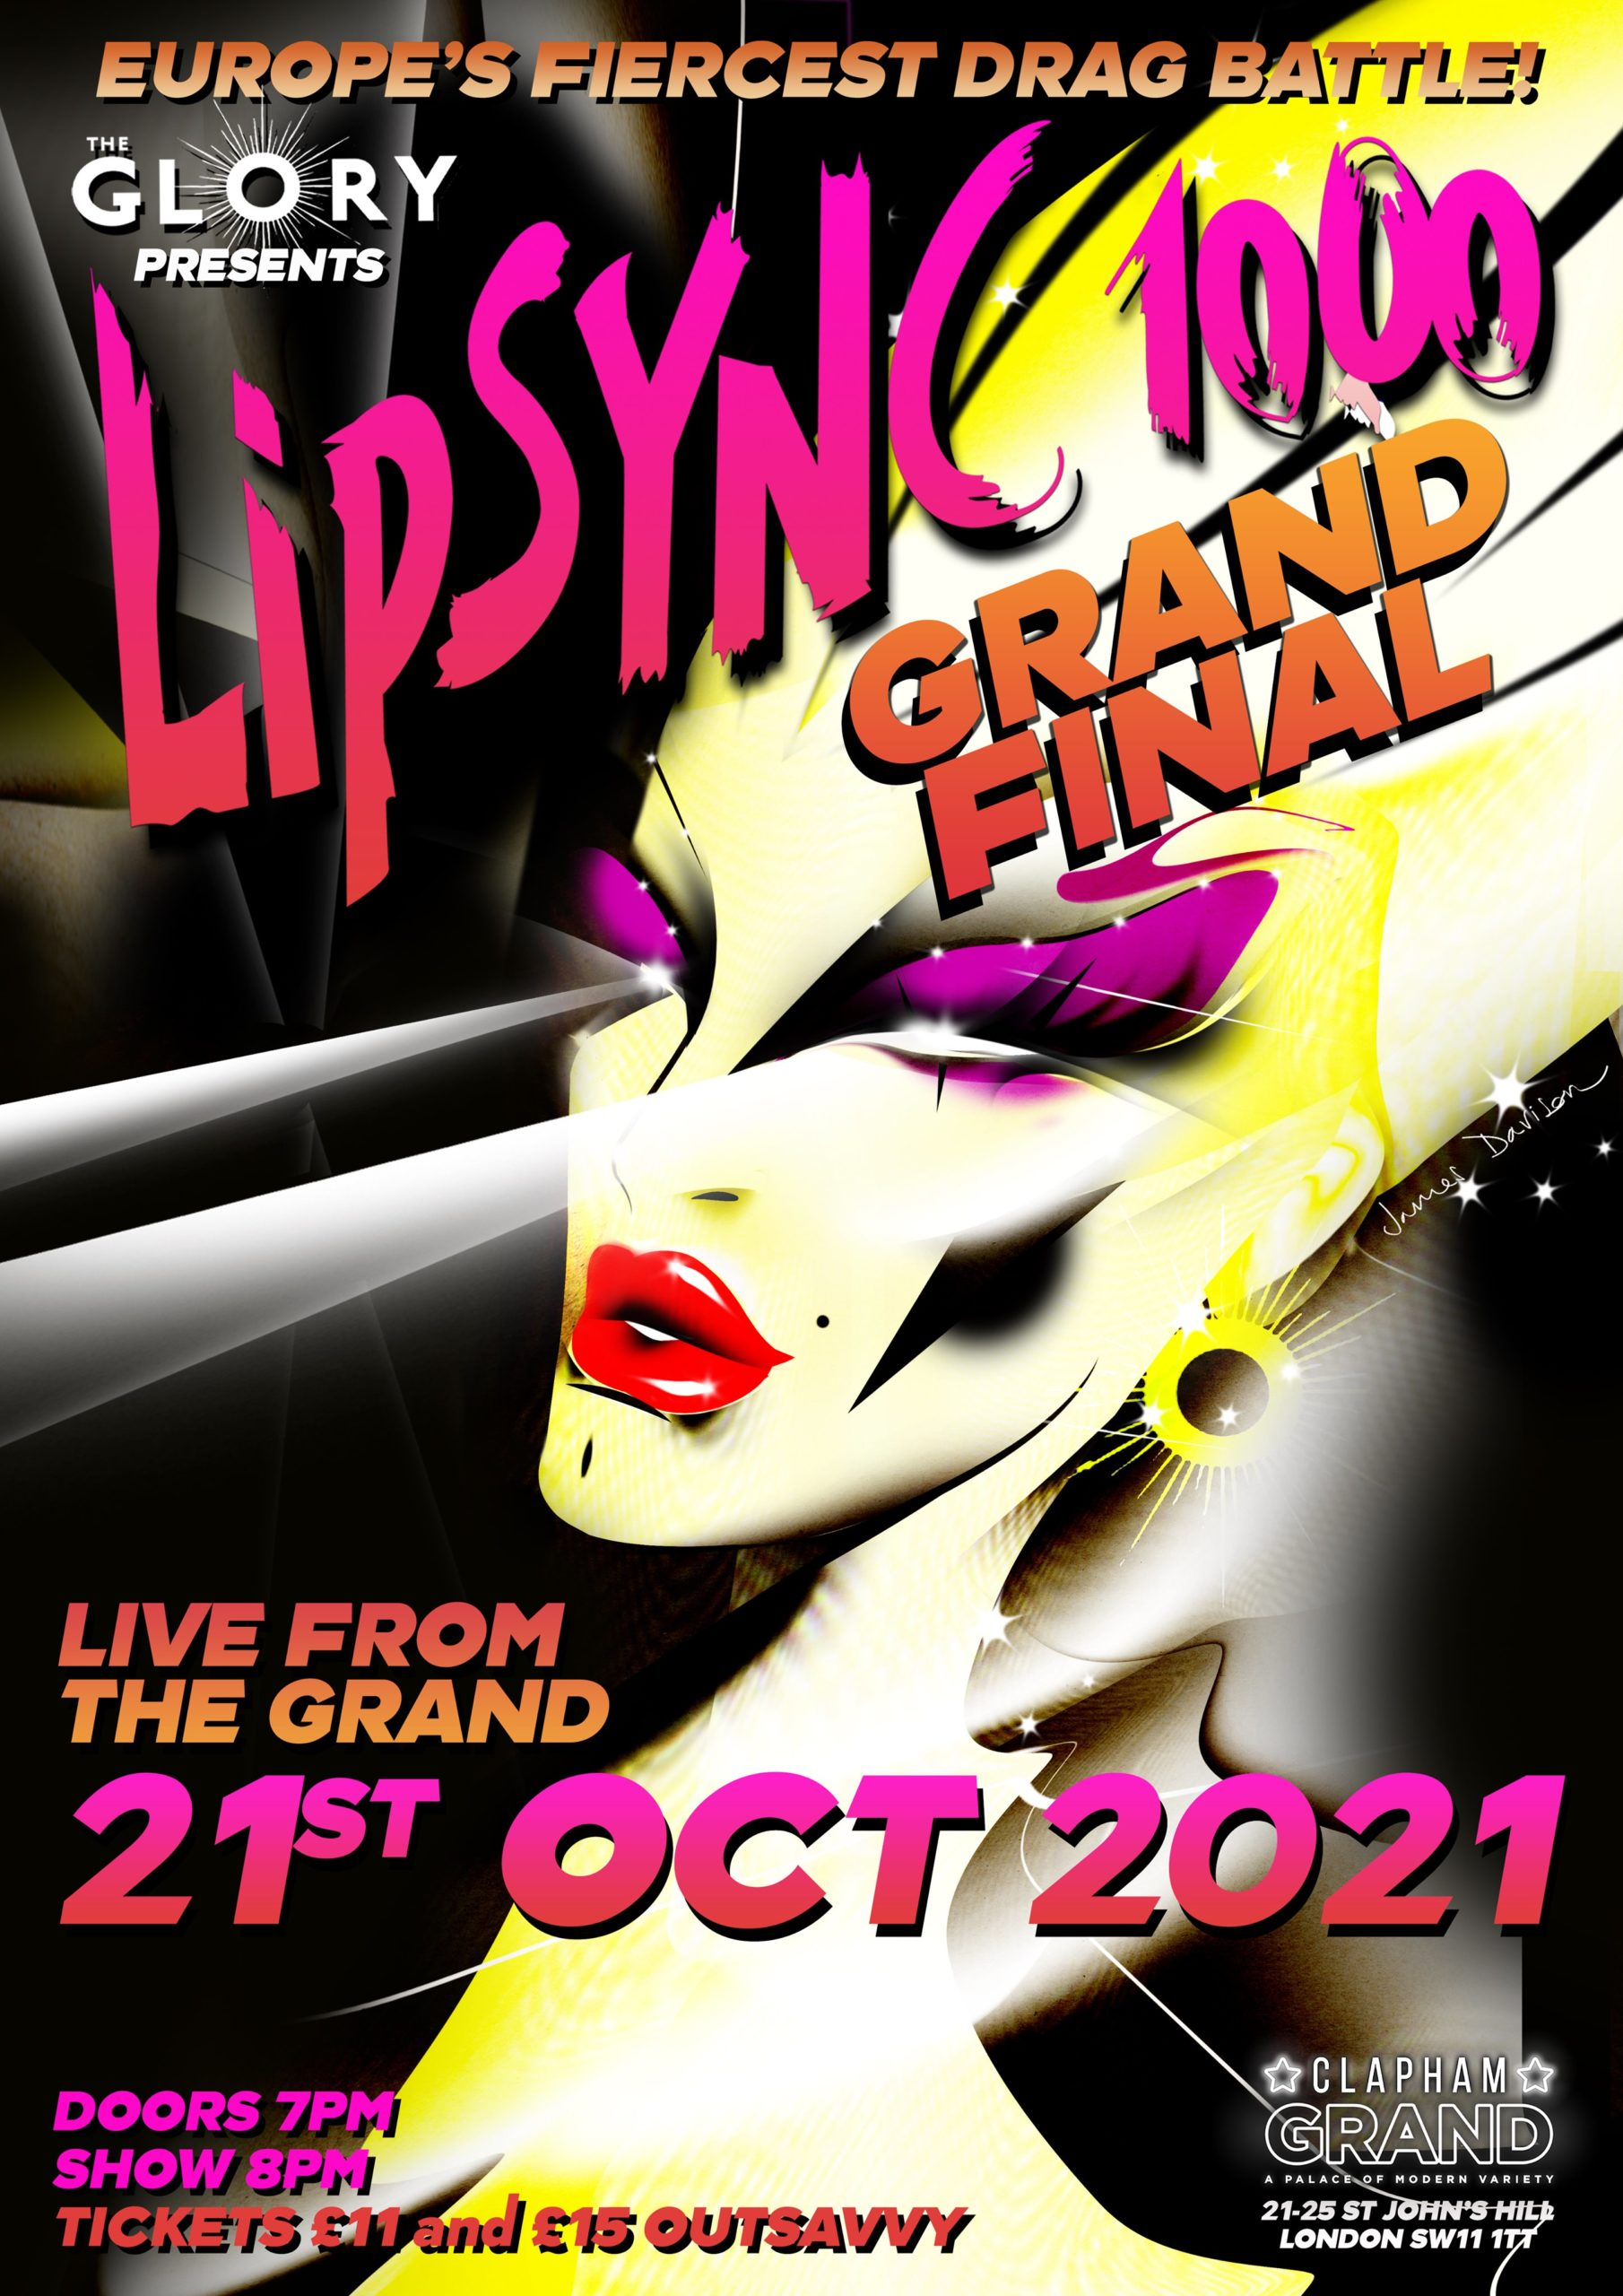 LIPSYNC1000 Grand Final @ The Clapham Grand